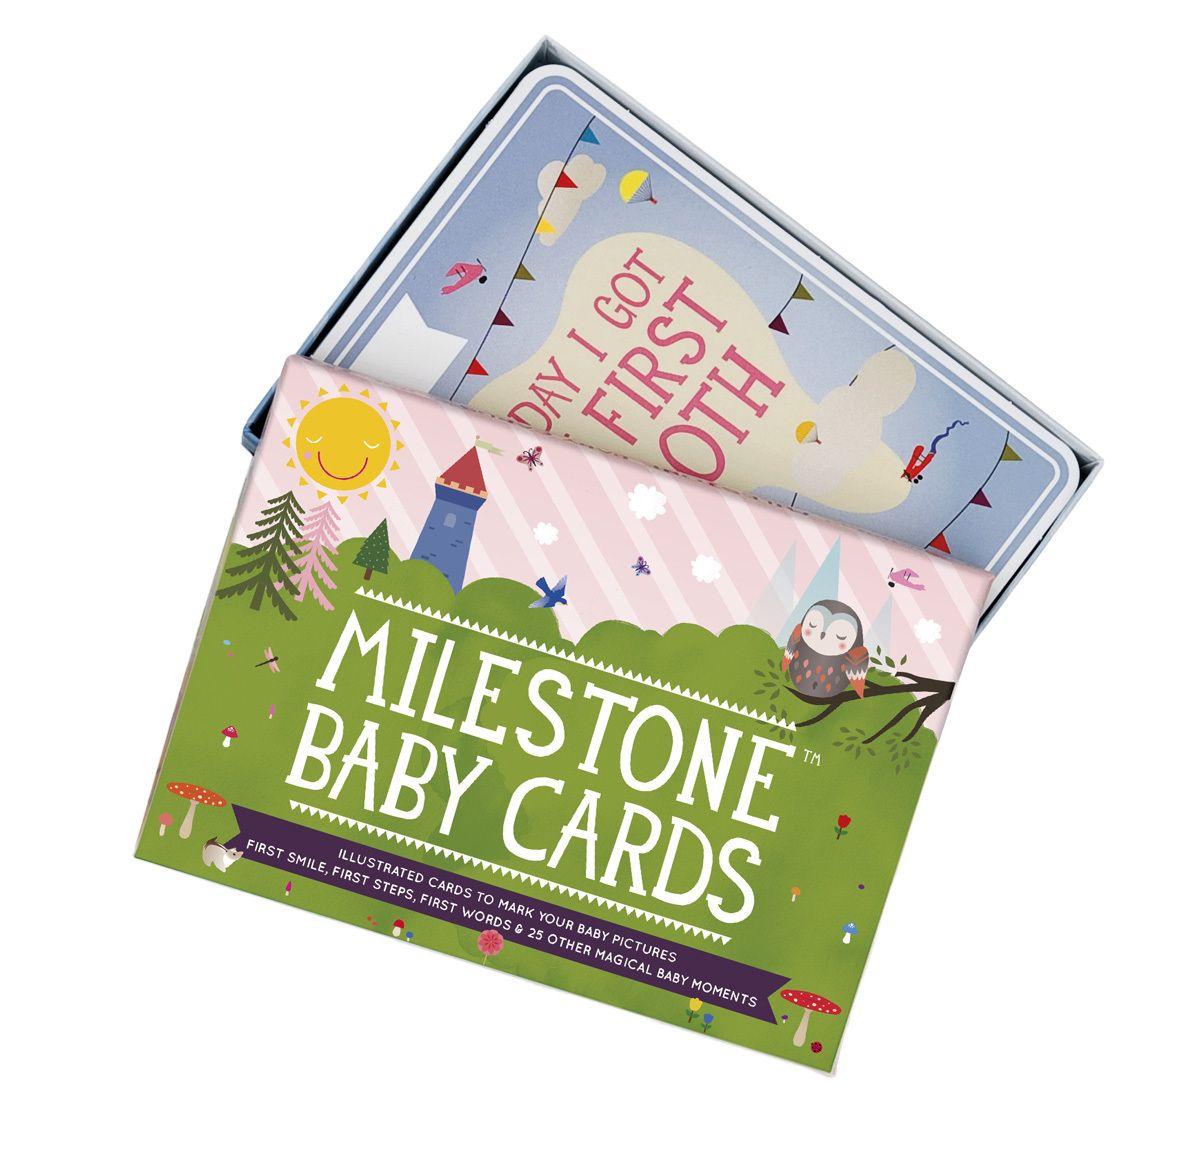 lilzippers - Milestone Cards, $29.95 (http://lilzippers.com.au/baby-store/milestone-cards/)